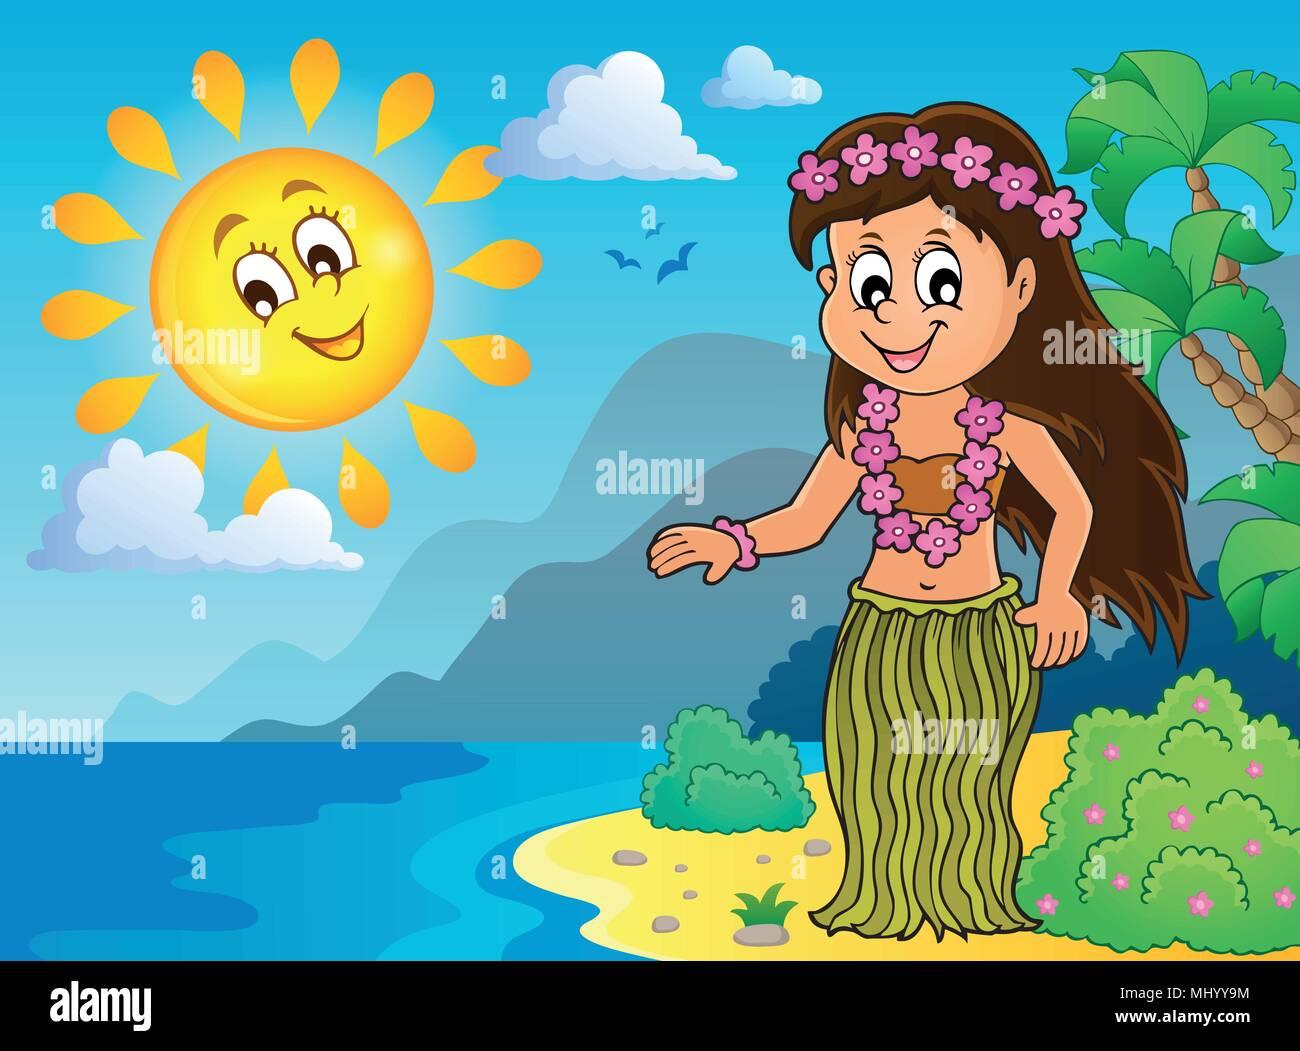 Hawaiian theme dancer image 3 - eps10 vector illustration. - Stock Vector